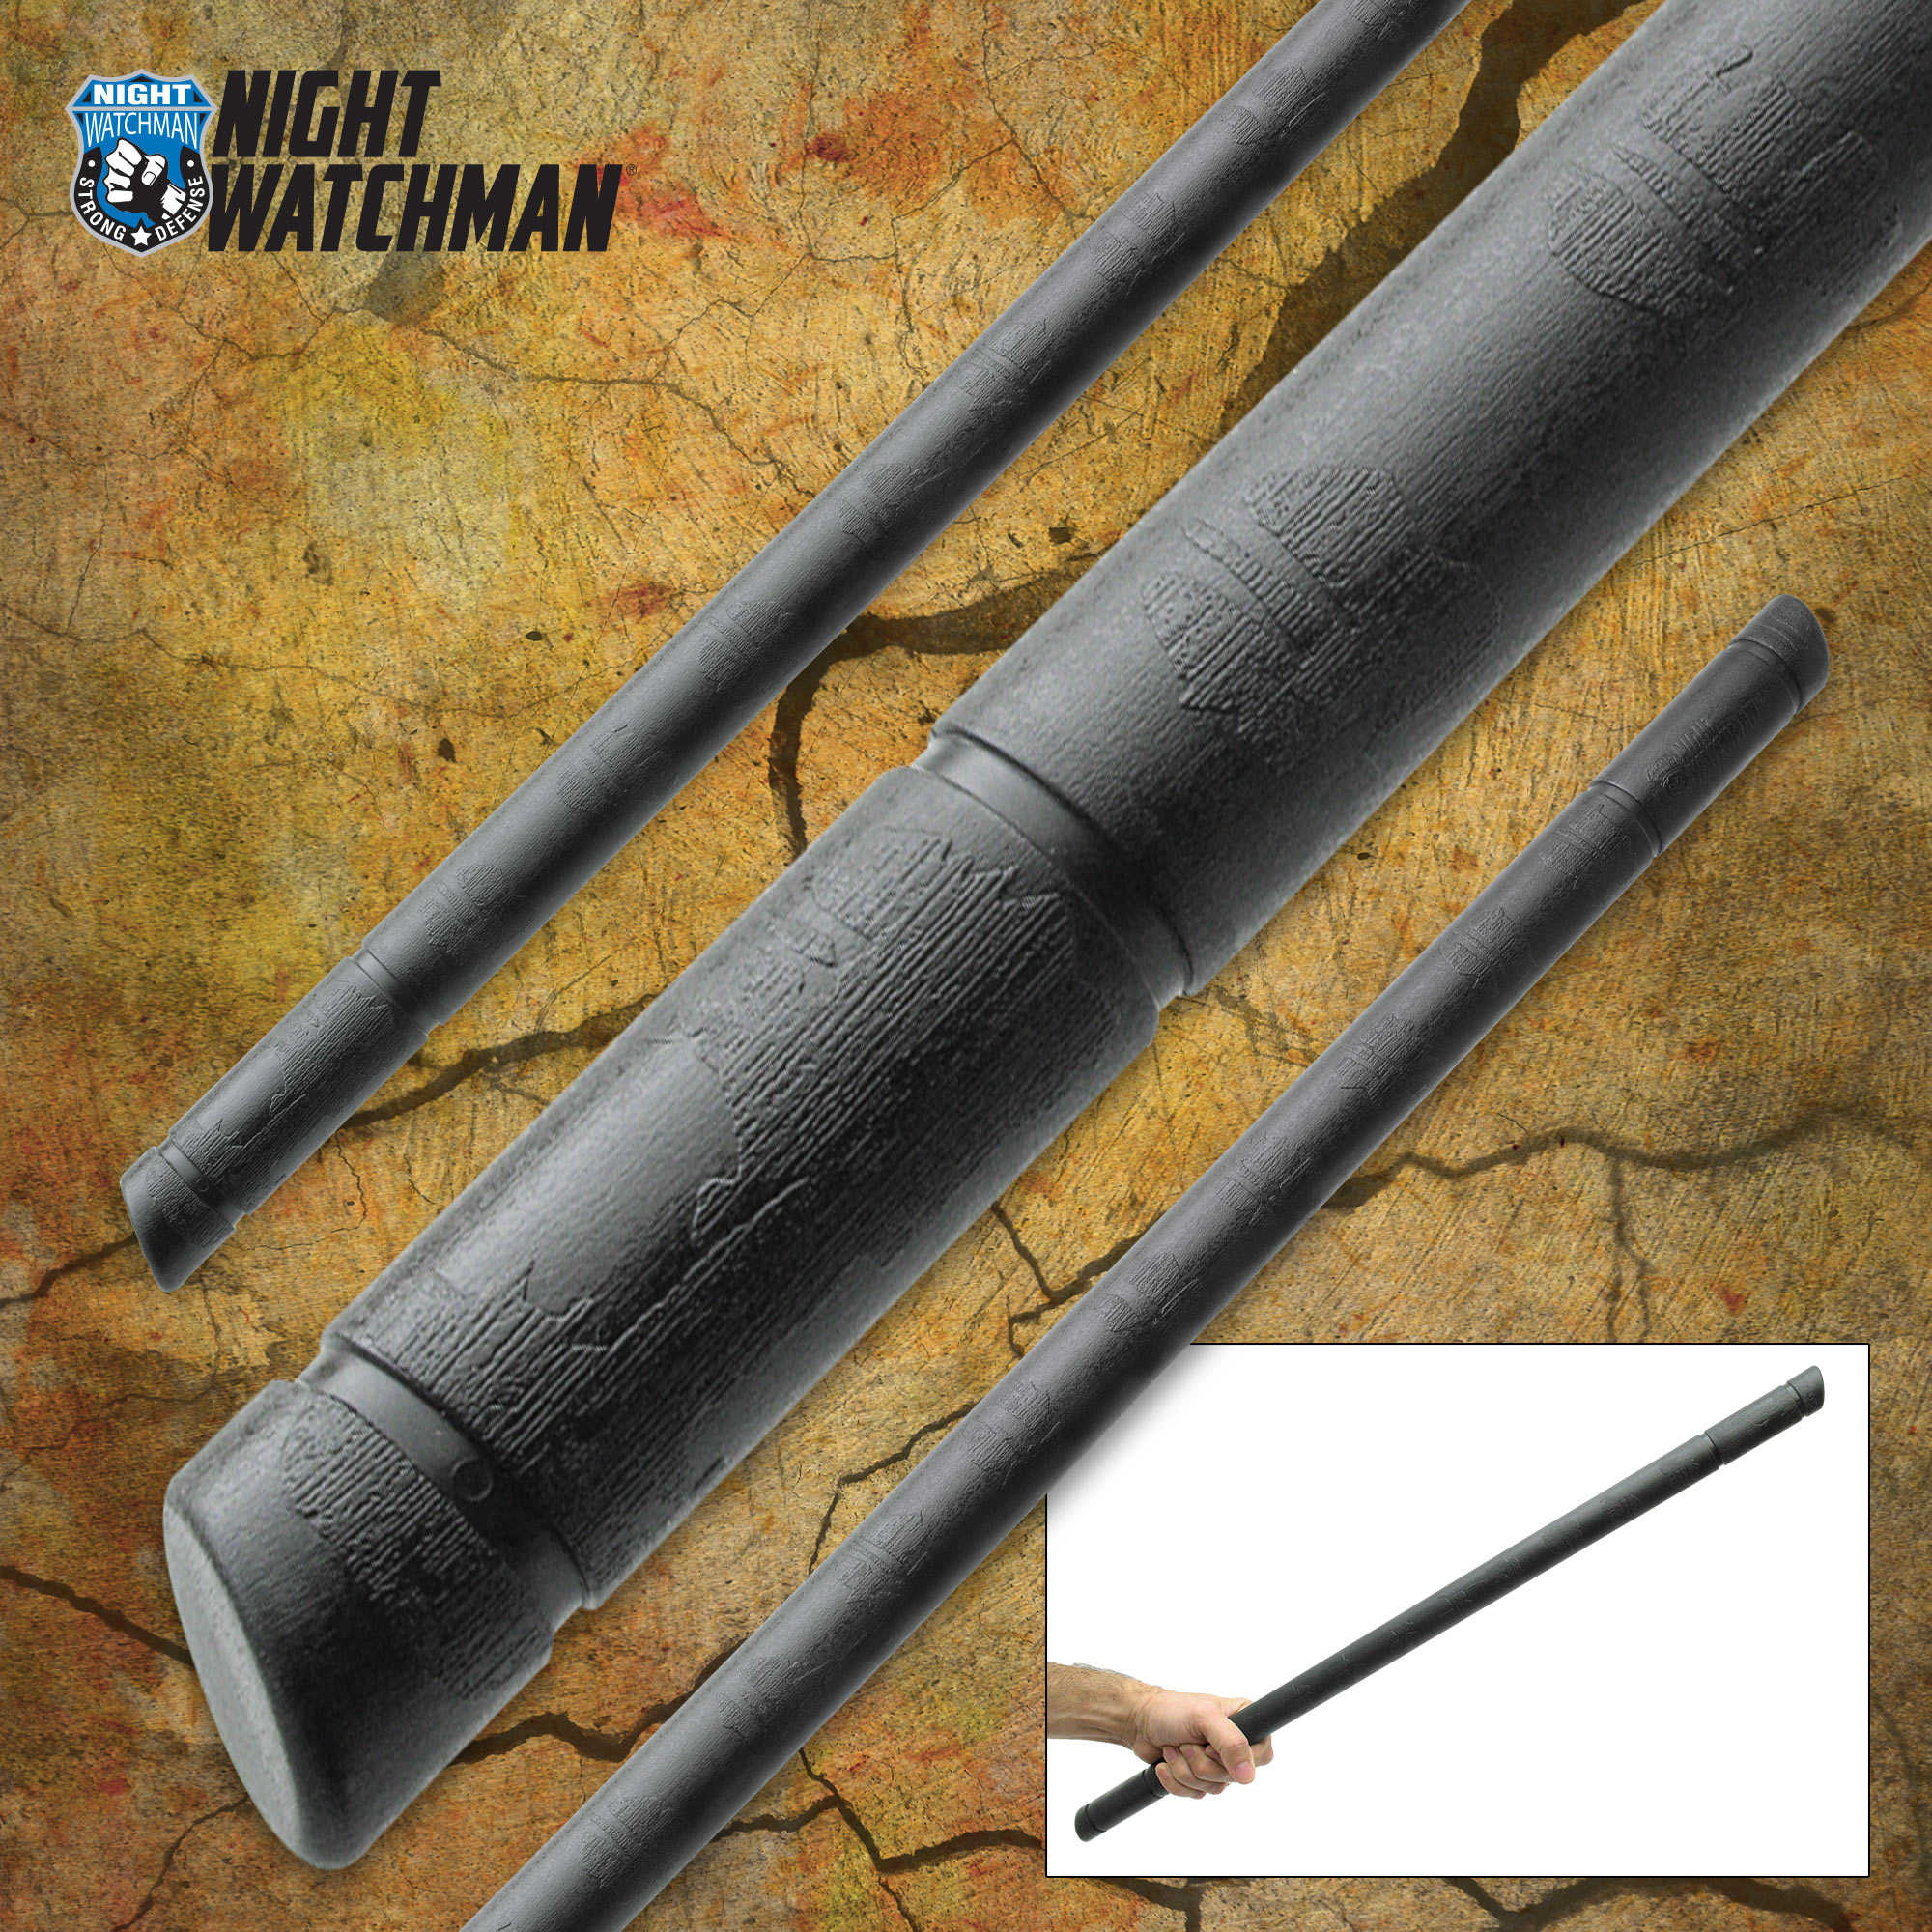 Night Watchman Escrima Fighting Stick - Polypropylene